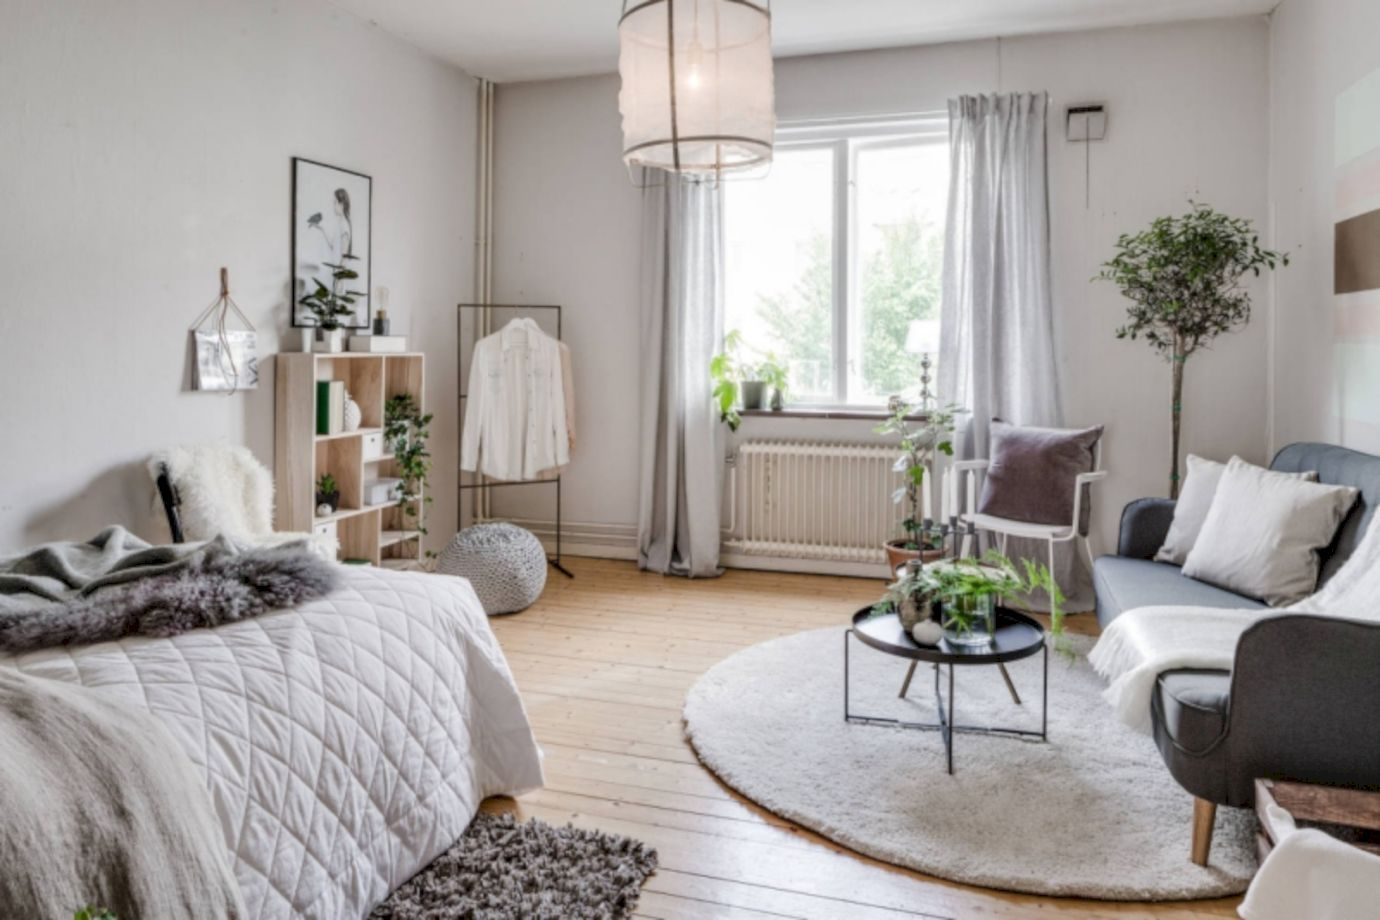 Awesome 50 Cozy Minimalist Studio Apartment Decor Ideas